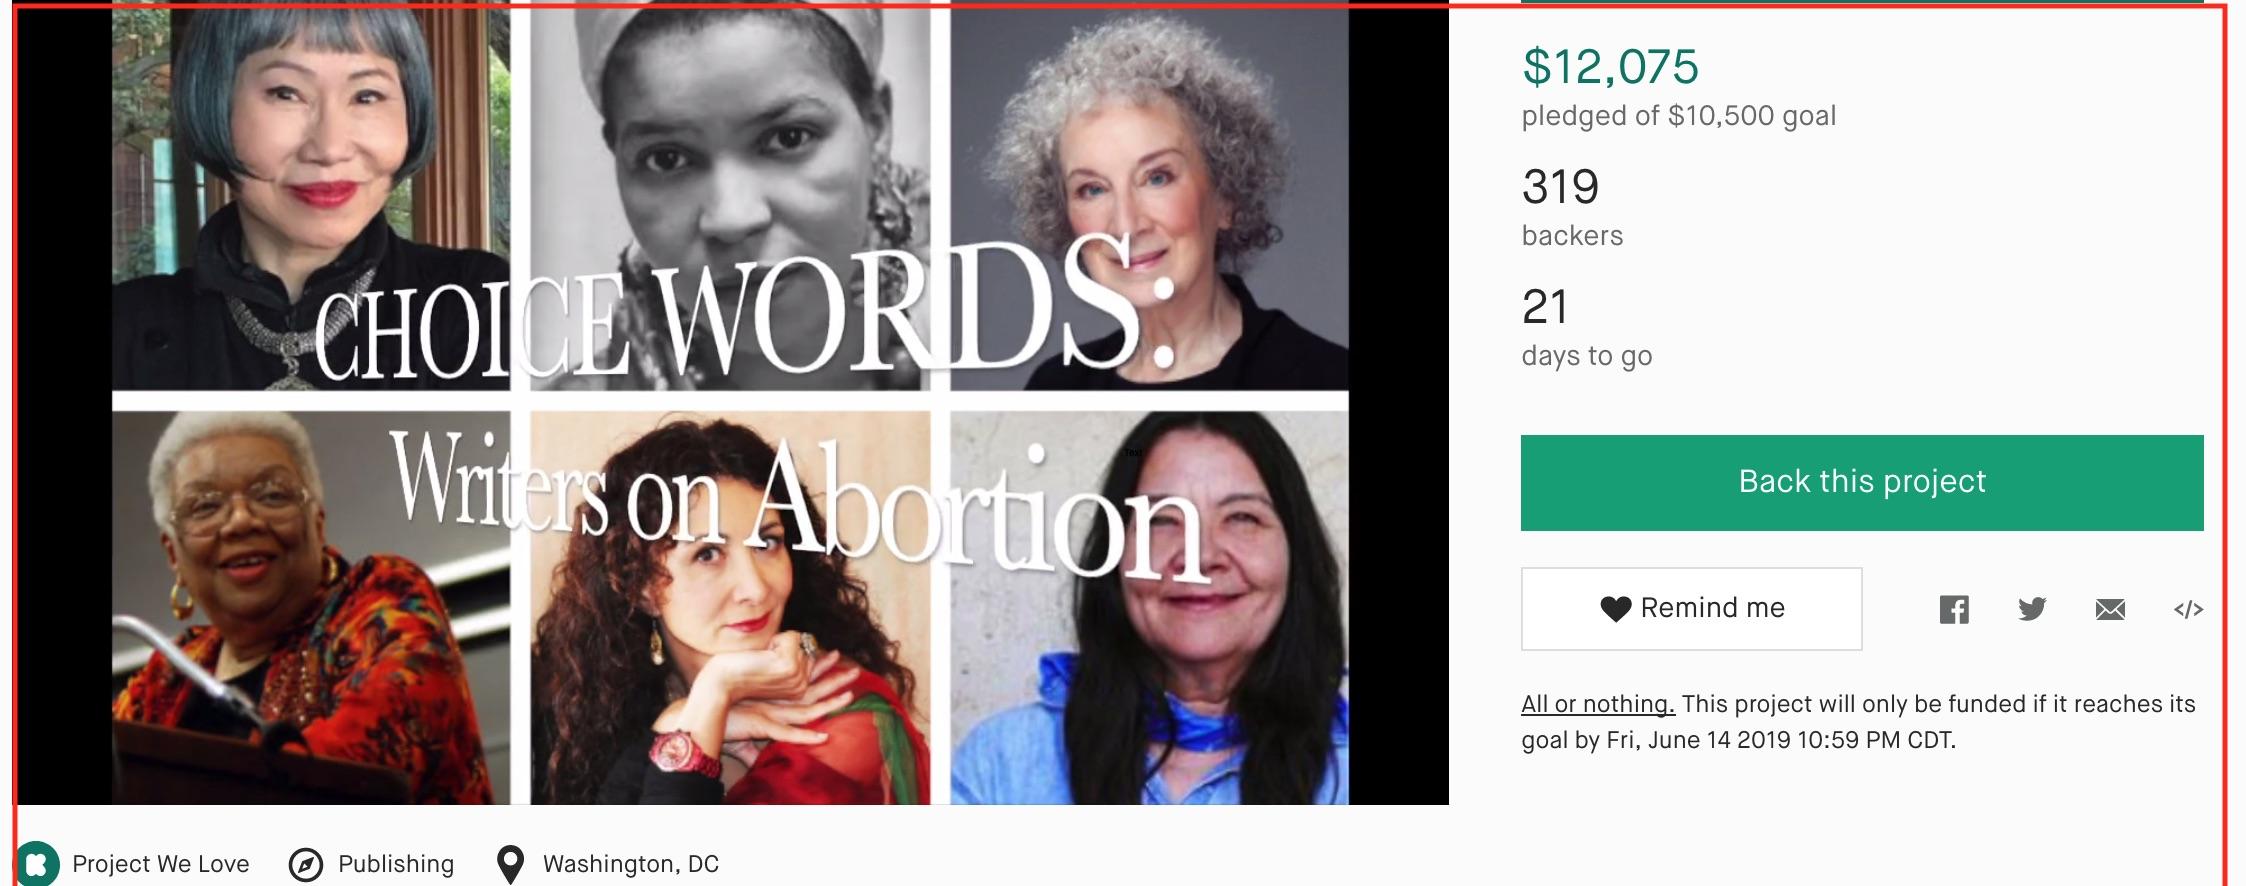 Kickstarter Campaign for Book on Abortion Surpasses Goal